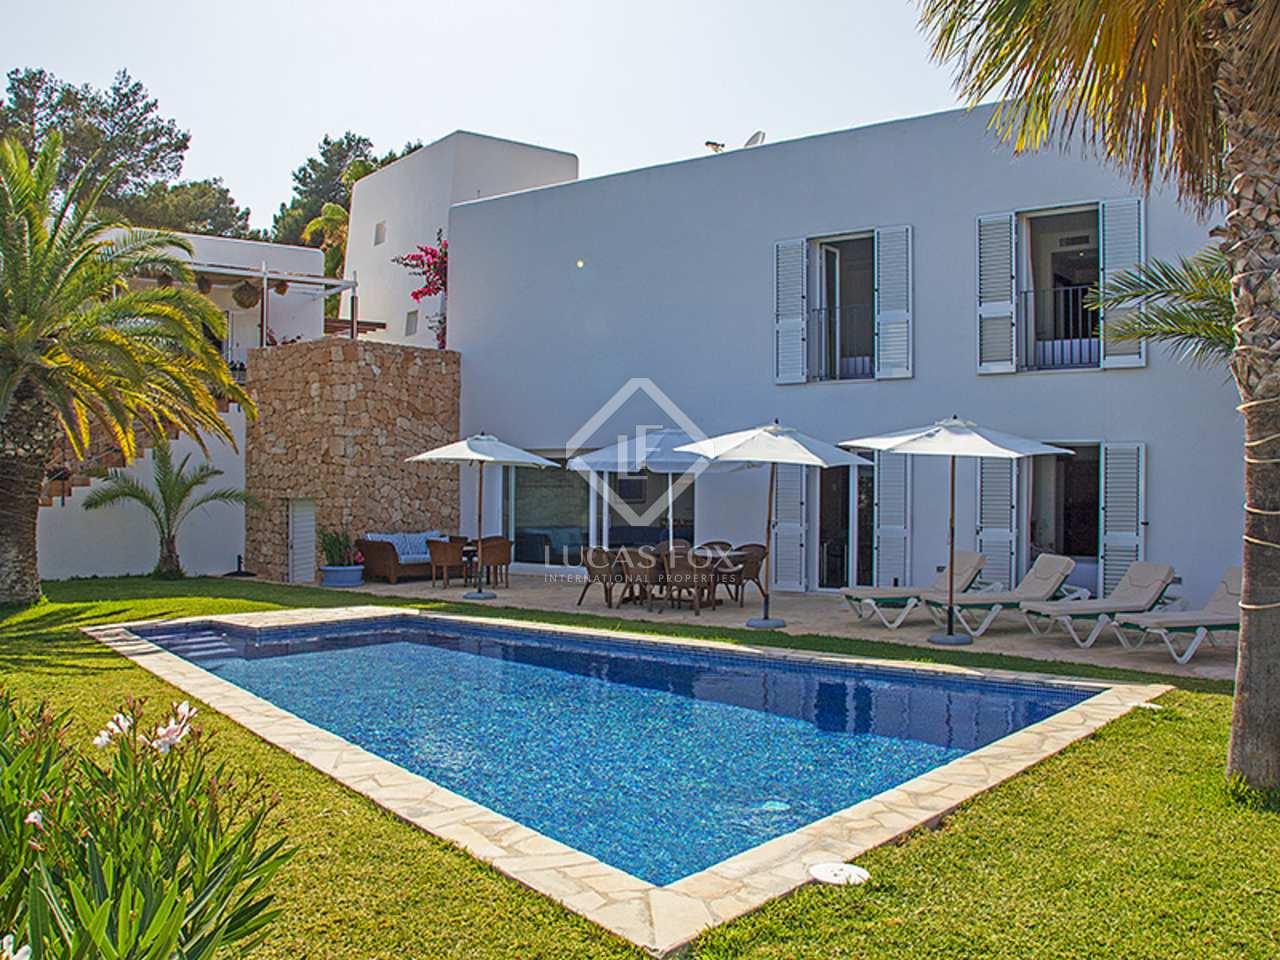 Alquiler Se Alquila Espectacular Casa 5 Dormitorios En Cap Martinet - Lfb620